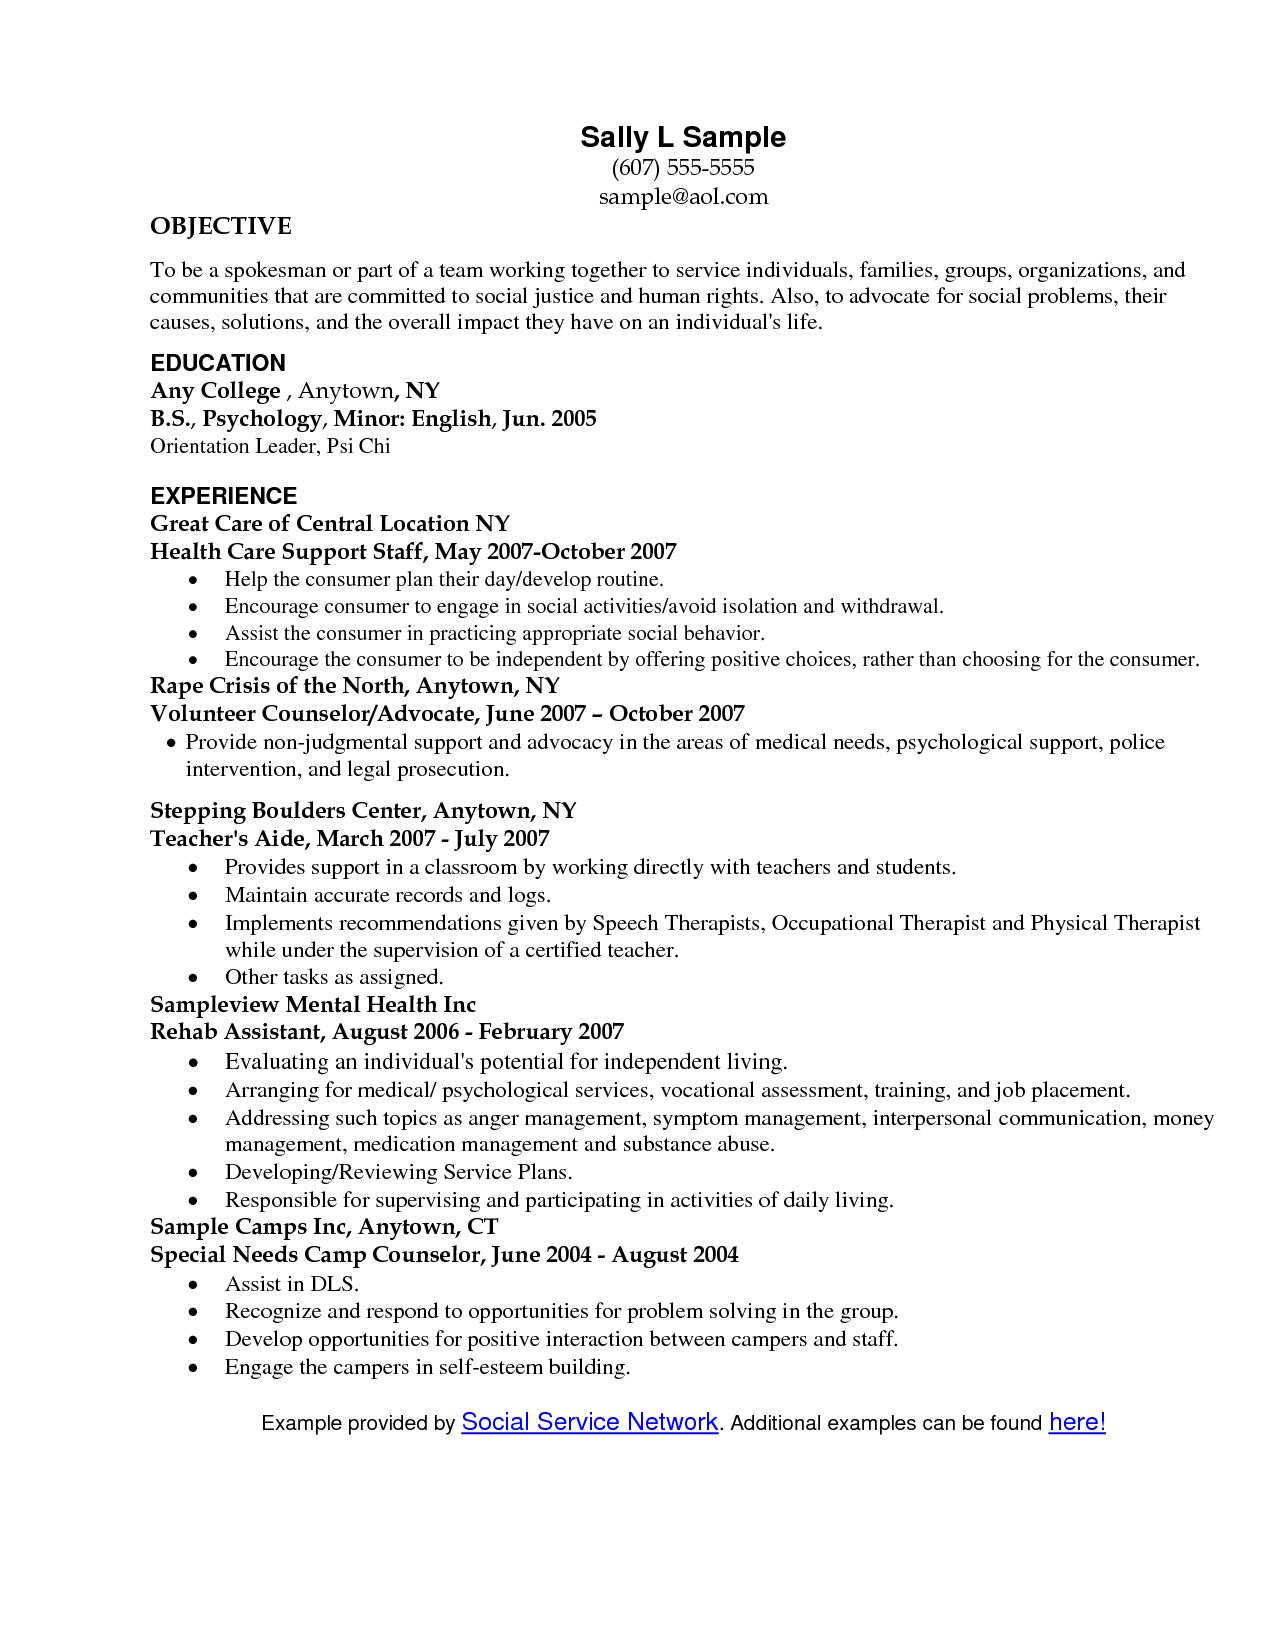 Social Service professional sample resume Google Search